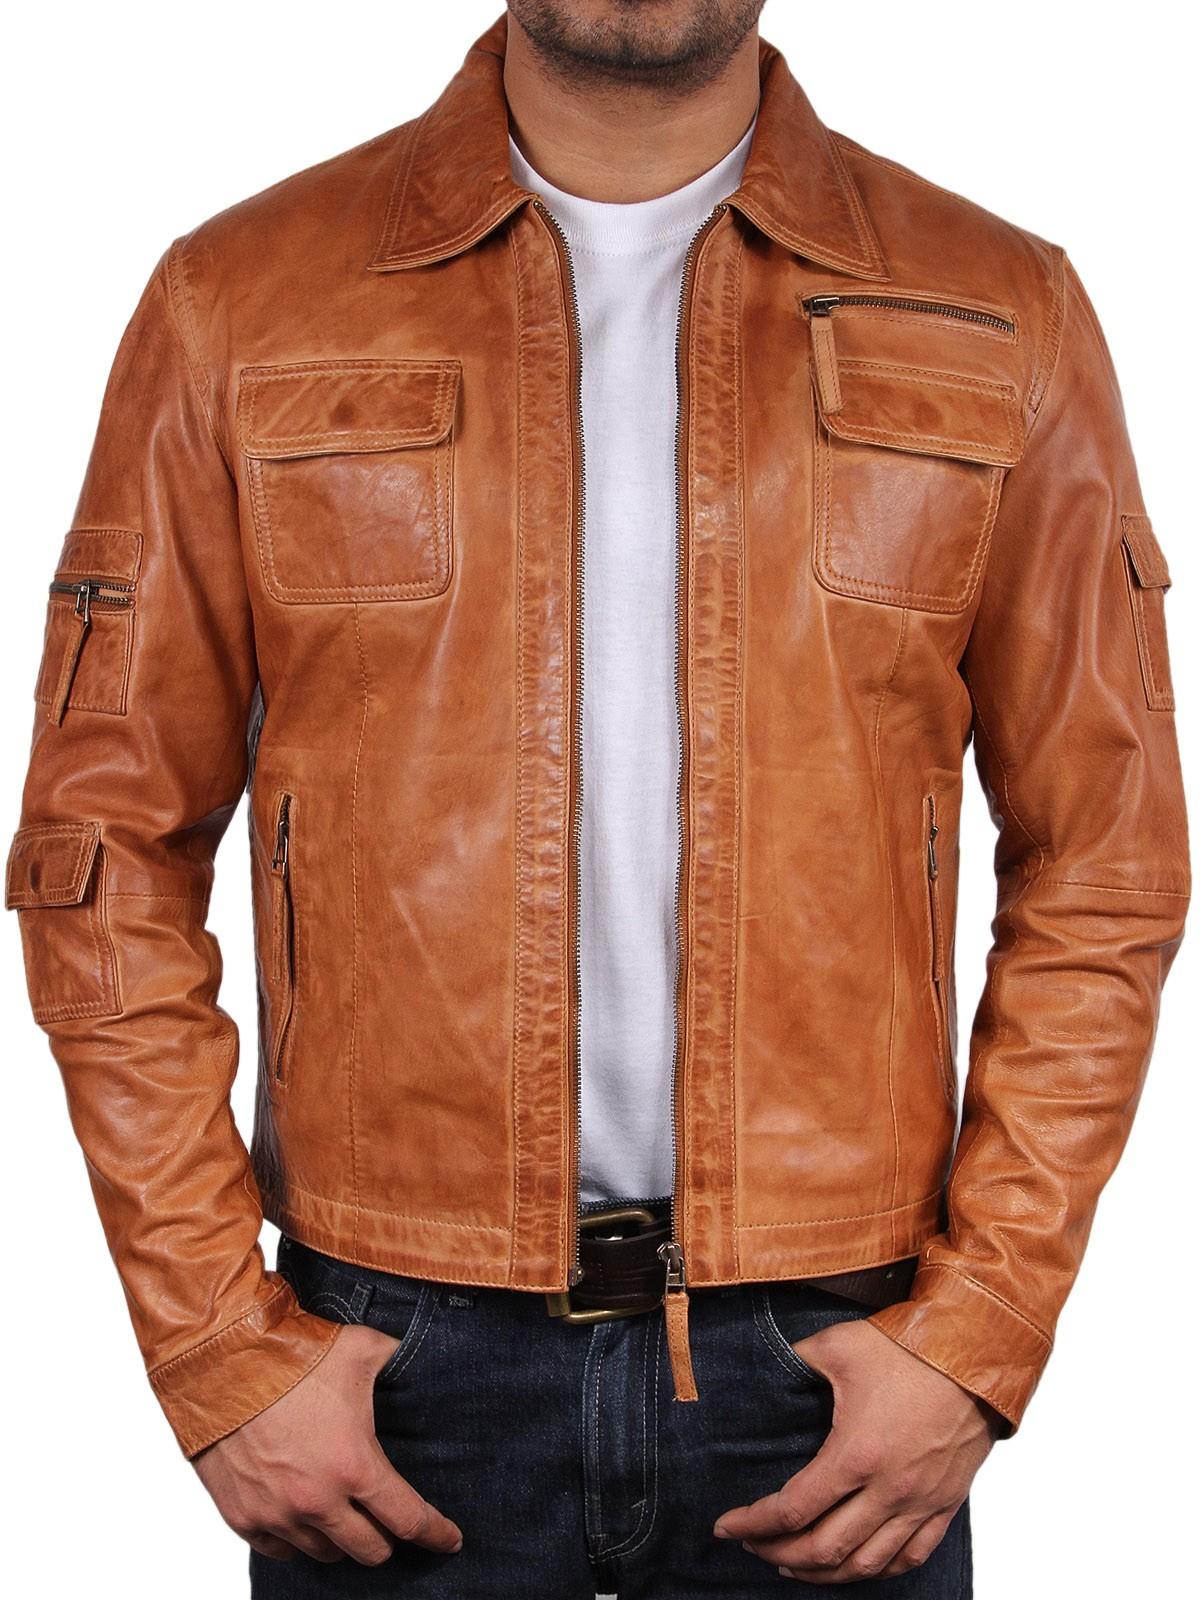 7916f7cb4 Mens Leather Biker Jacket Genuine Lambskin Leather